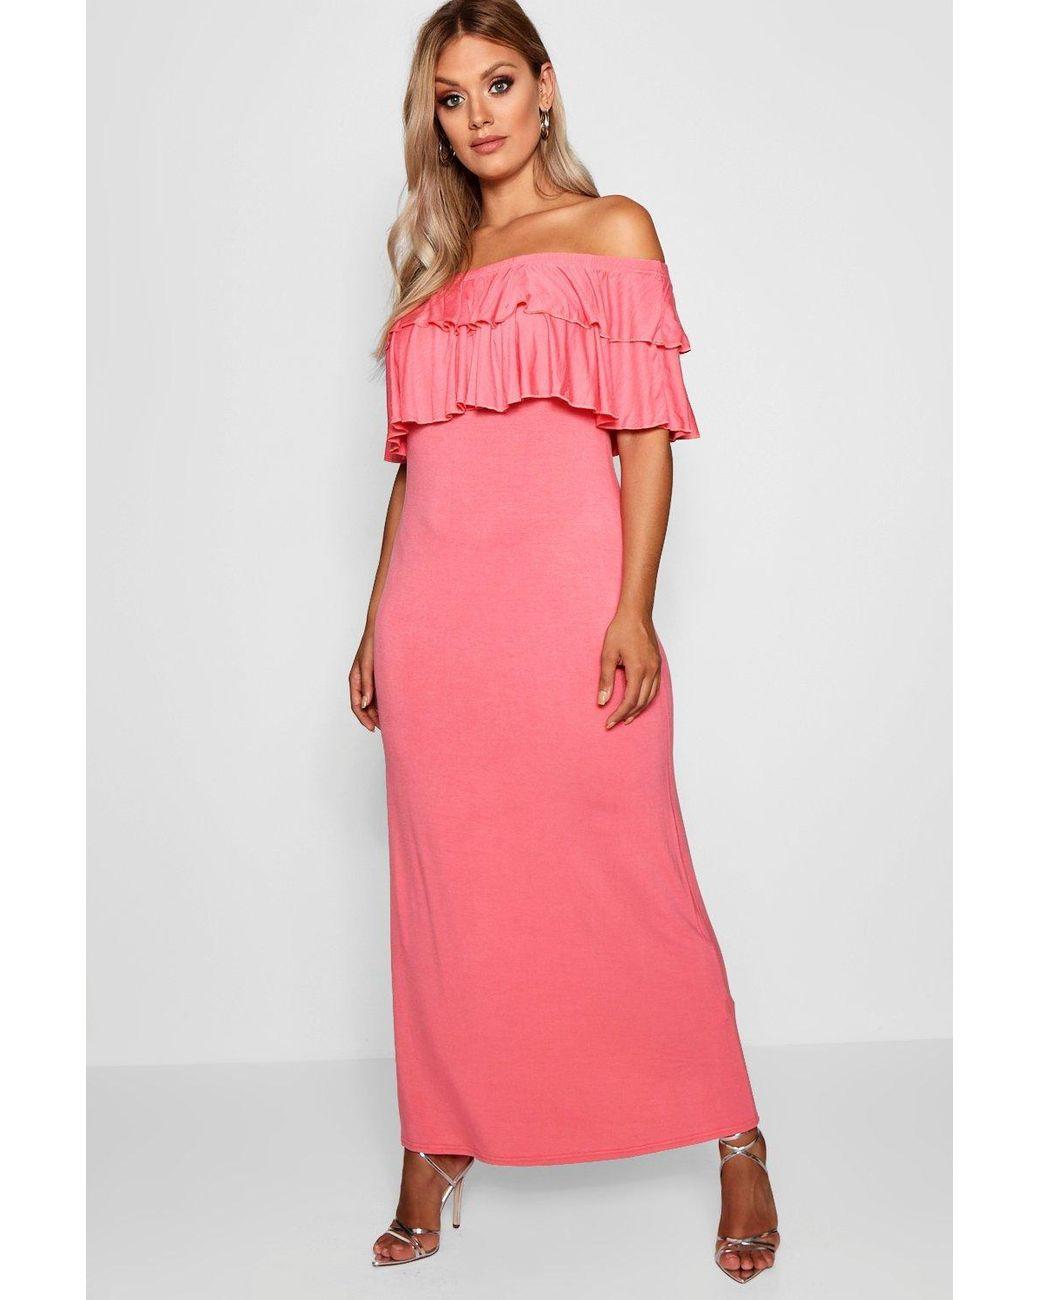 ef4dd6dce576 Boohoo Plus Off The Shoulder Ruffle Maxi Dress in Pink - Lyst